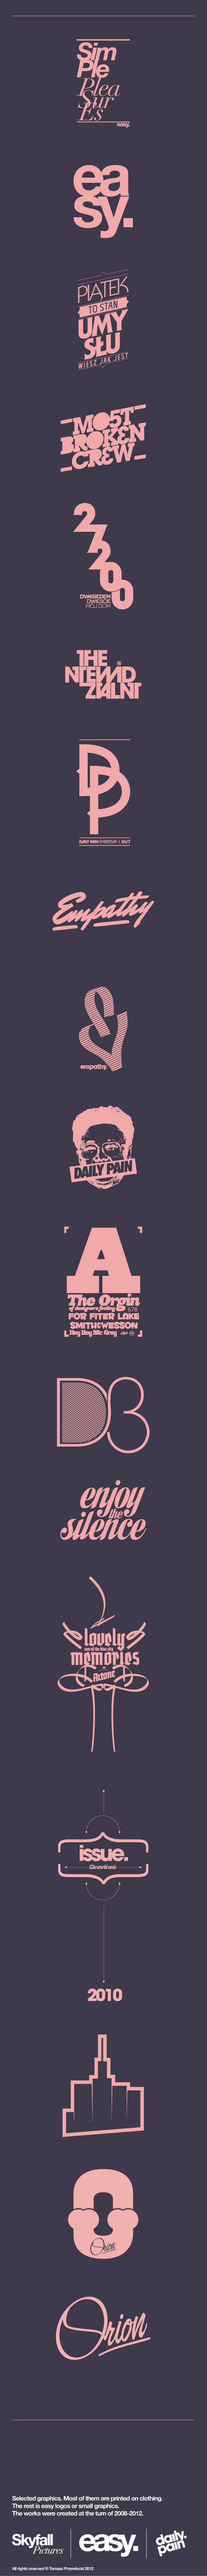 Vectors Pack 2008-2012 on #Behance #Design #Logos